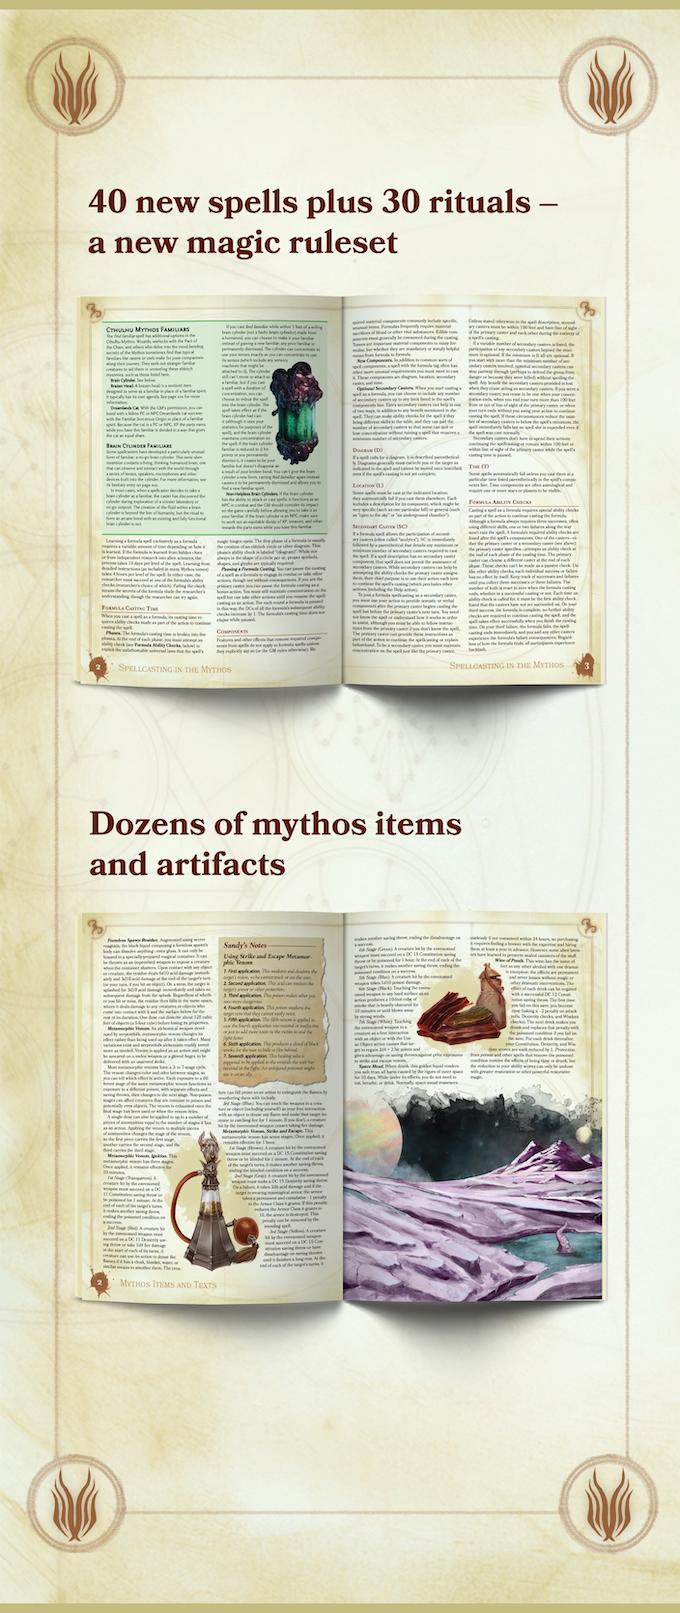 Sandy Petersen's Cthulhu Mythos for 5e by Sandy Petersen — Kickstarter